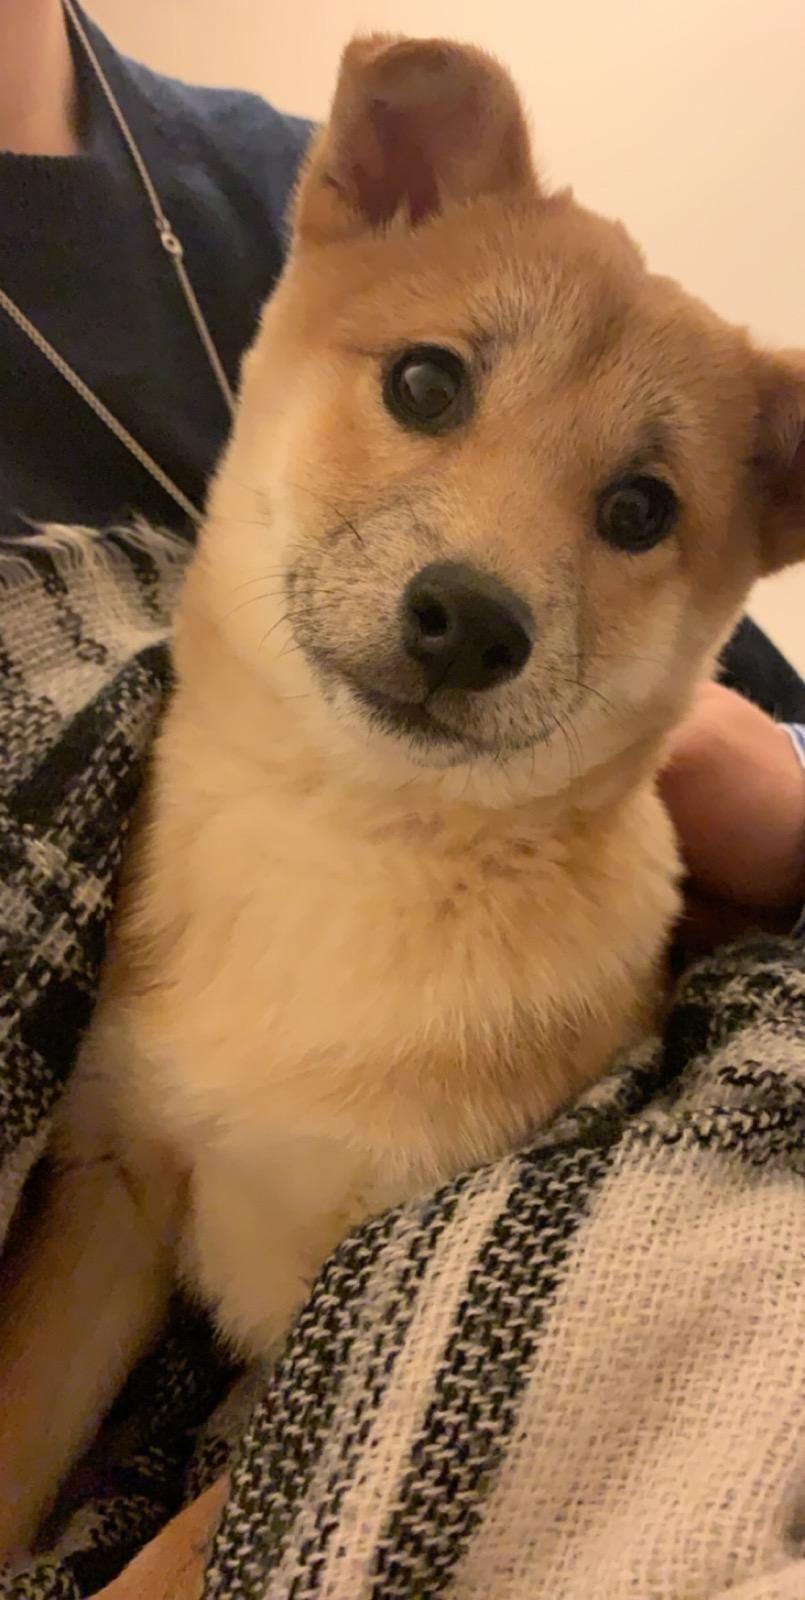 Corgi Shiba Inu Mix Reviewed By Vets 3 Reasons To Avoid Doggypedia In 2020 Shiba Inu Shiba Inu Mix Puppy Breeds